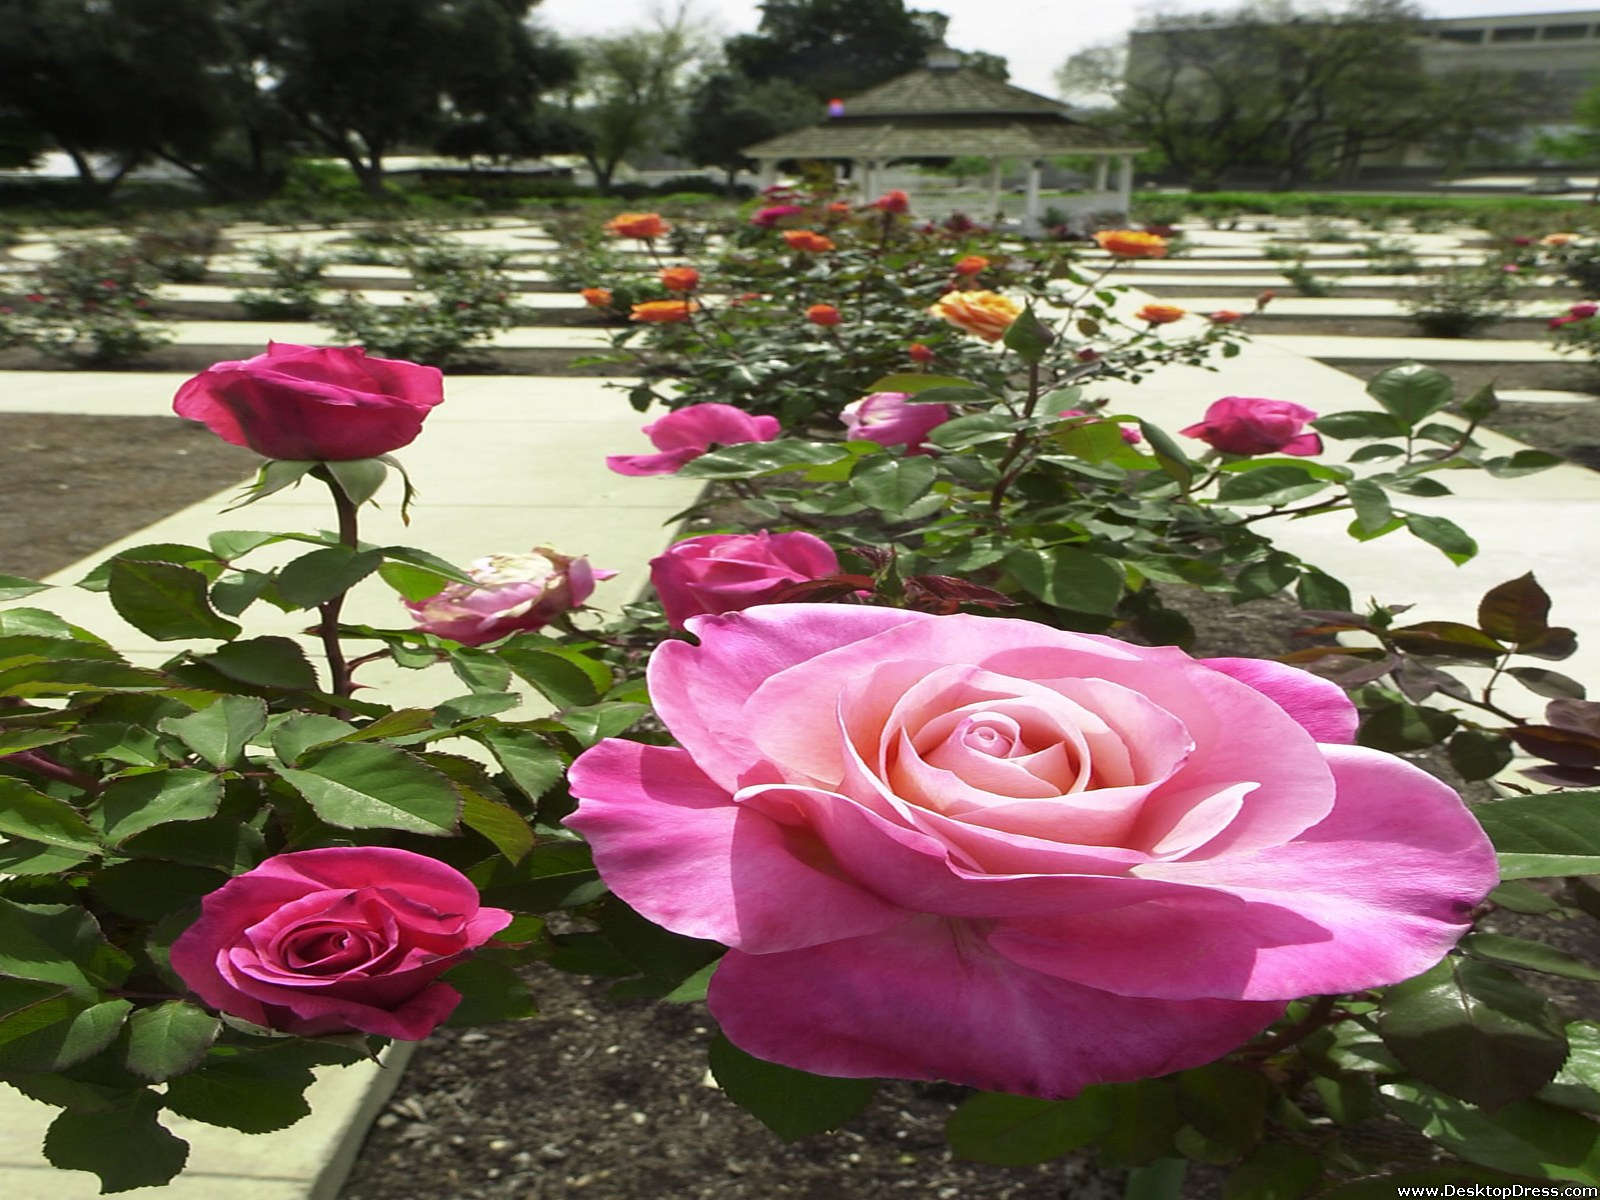 42+ Rose Garden Wallpaper Desktops on WallpaperSafari